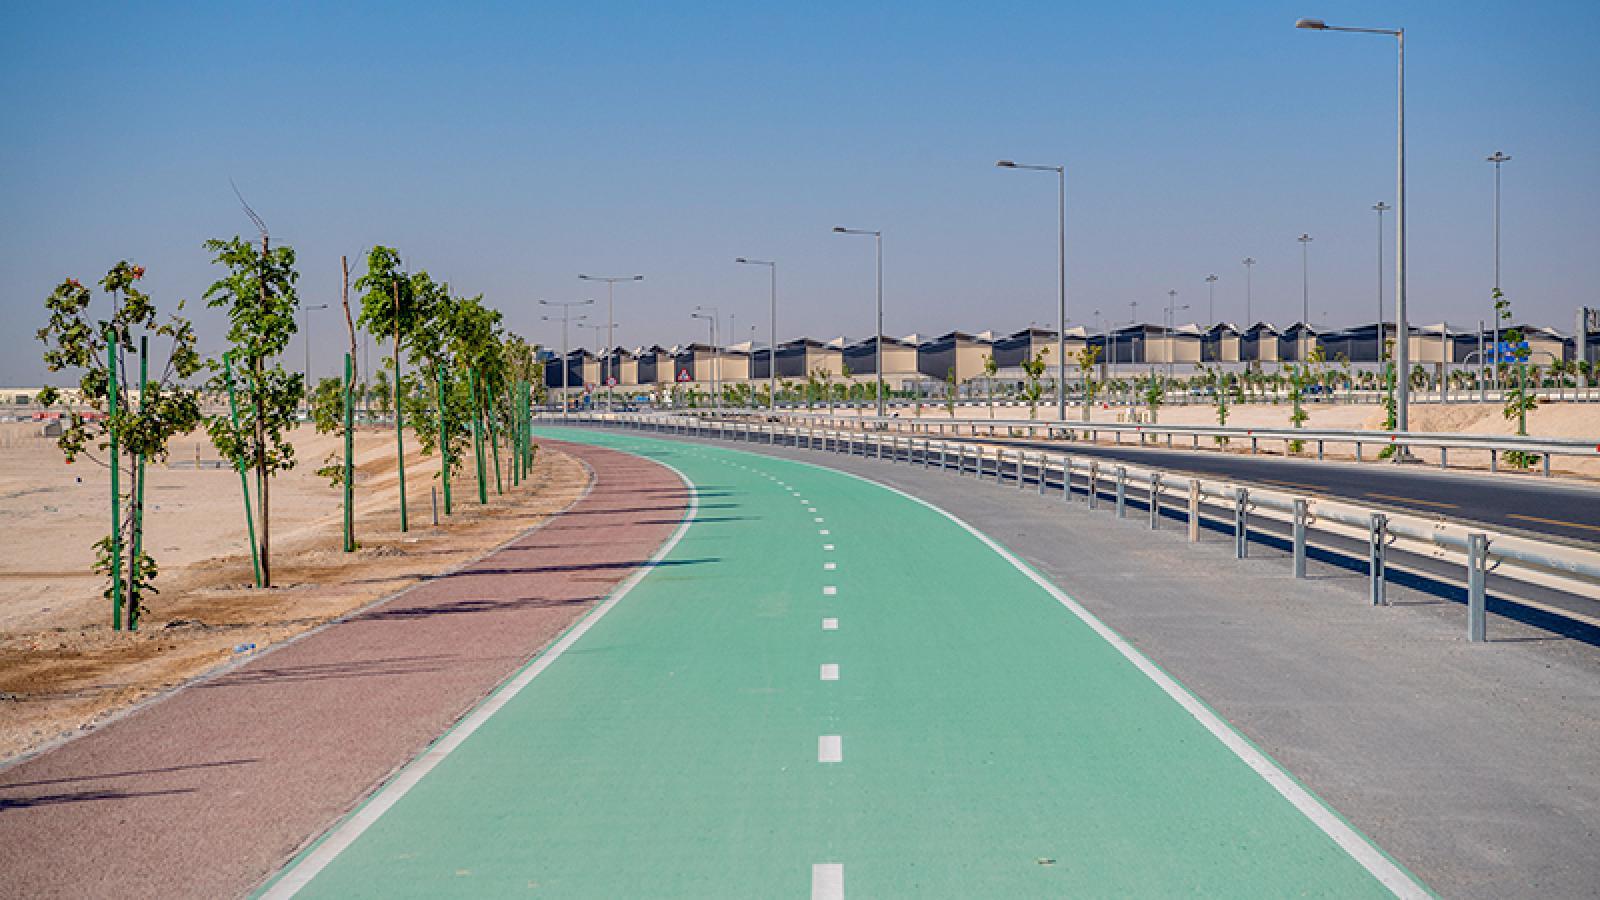 Ashghal opens 38km long shared pedestrian cycling path on Al Khor road